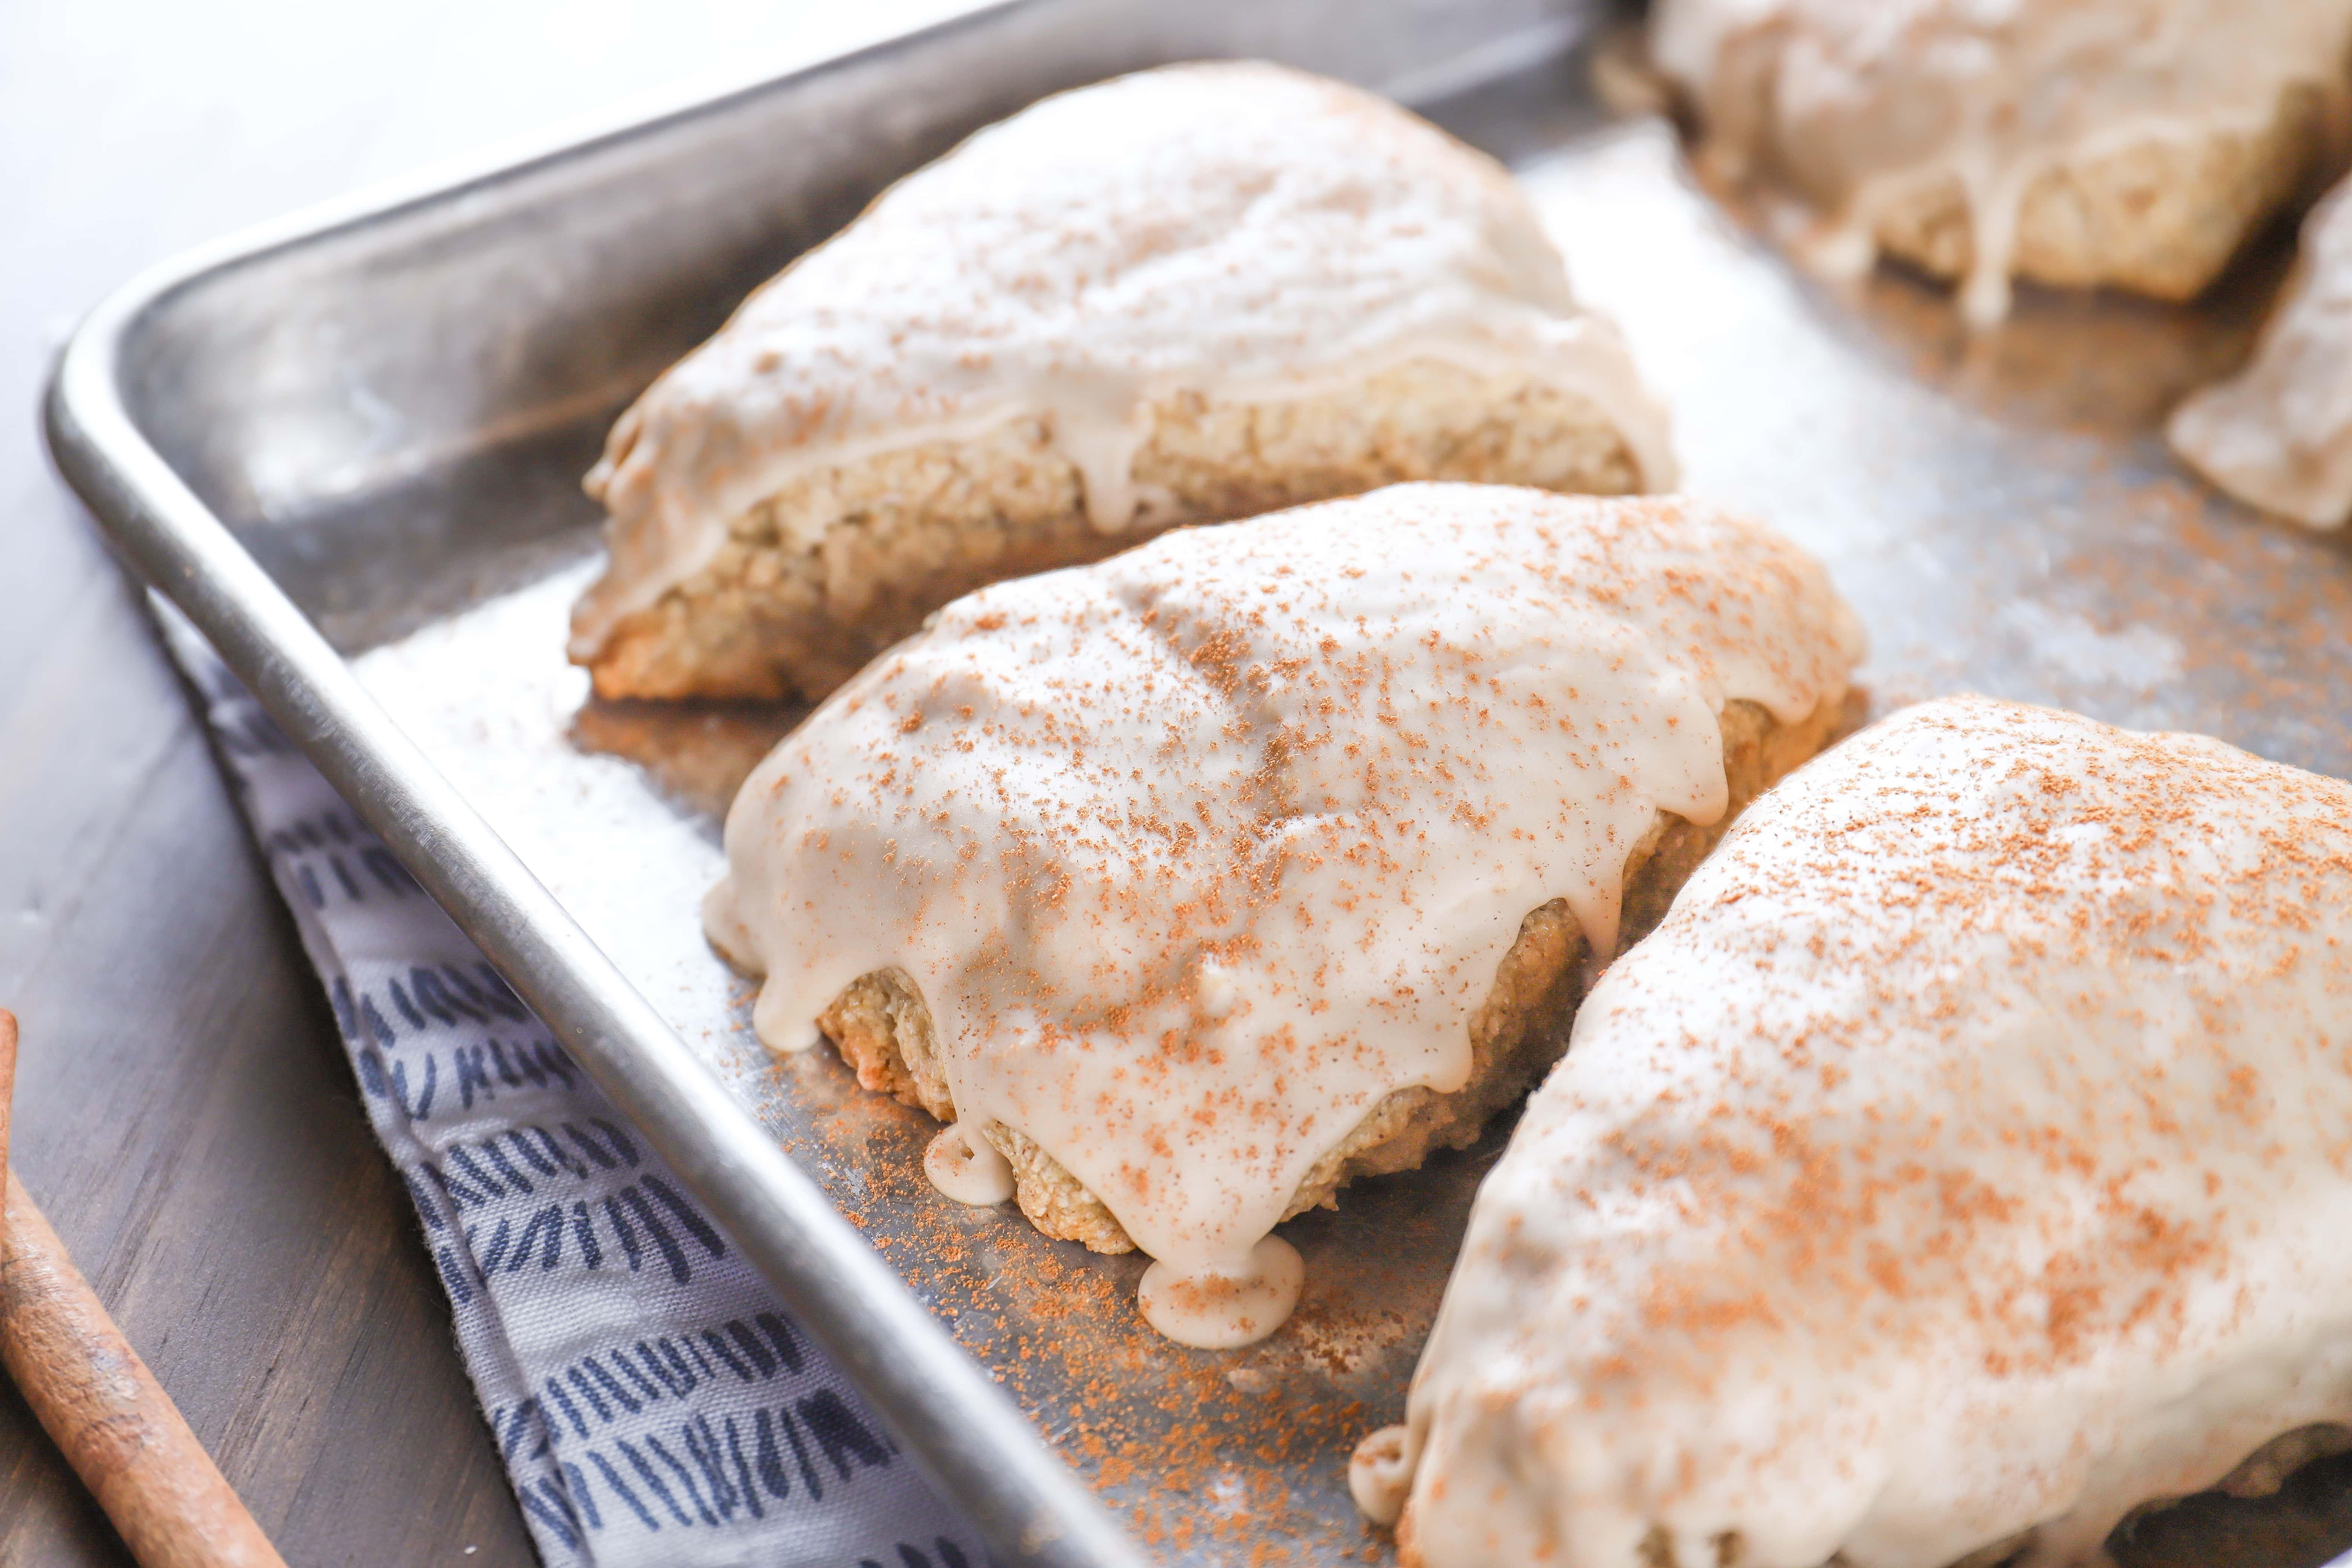 Glazed Maple Chai Scones on Baking Sheet